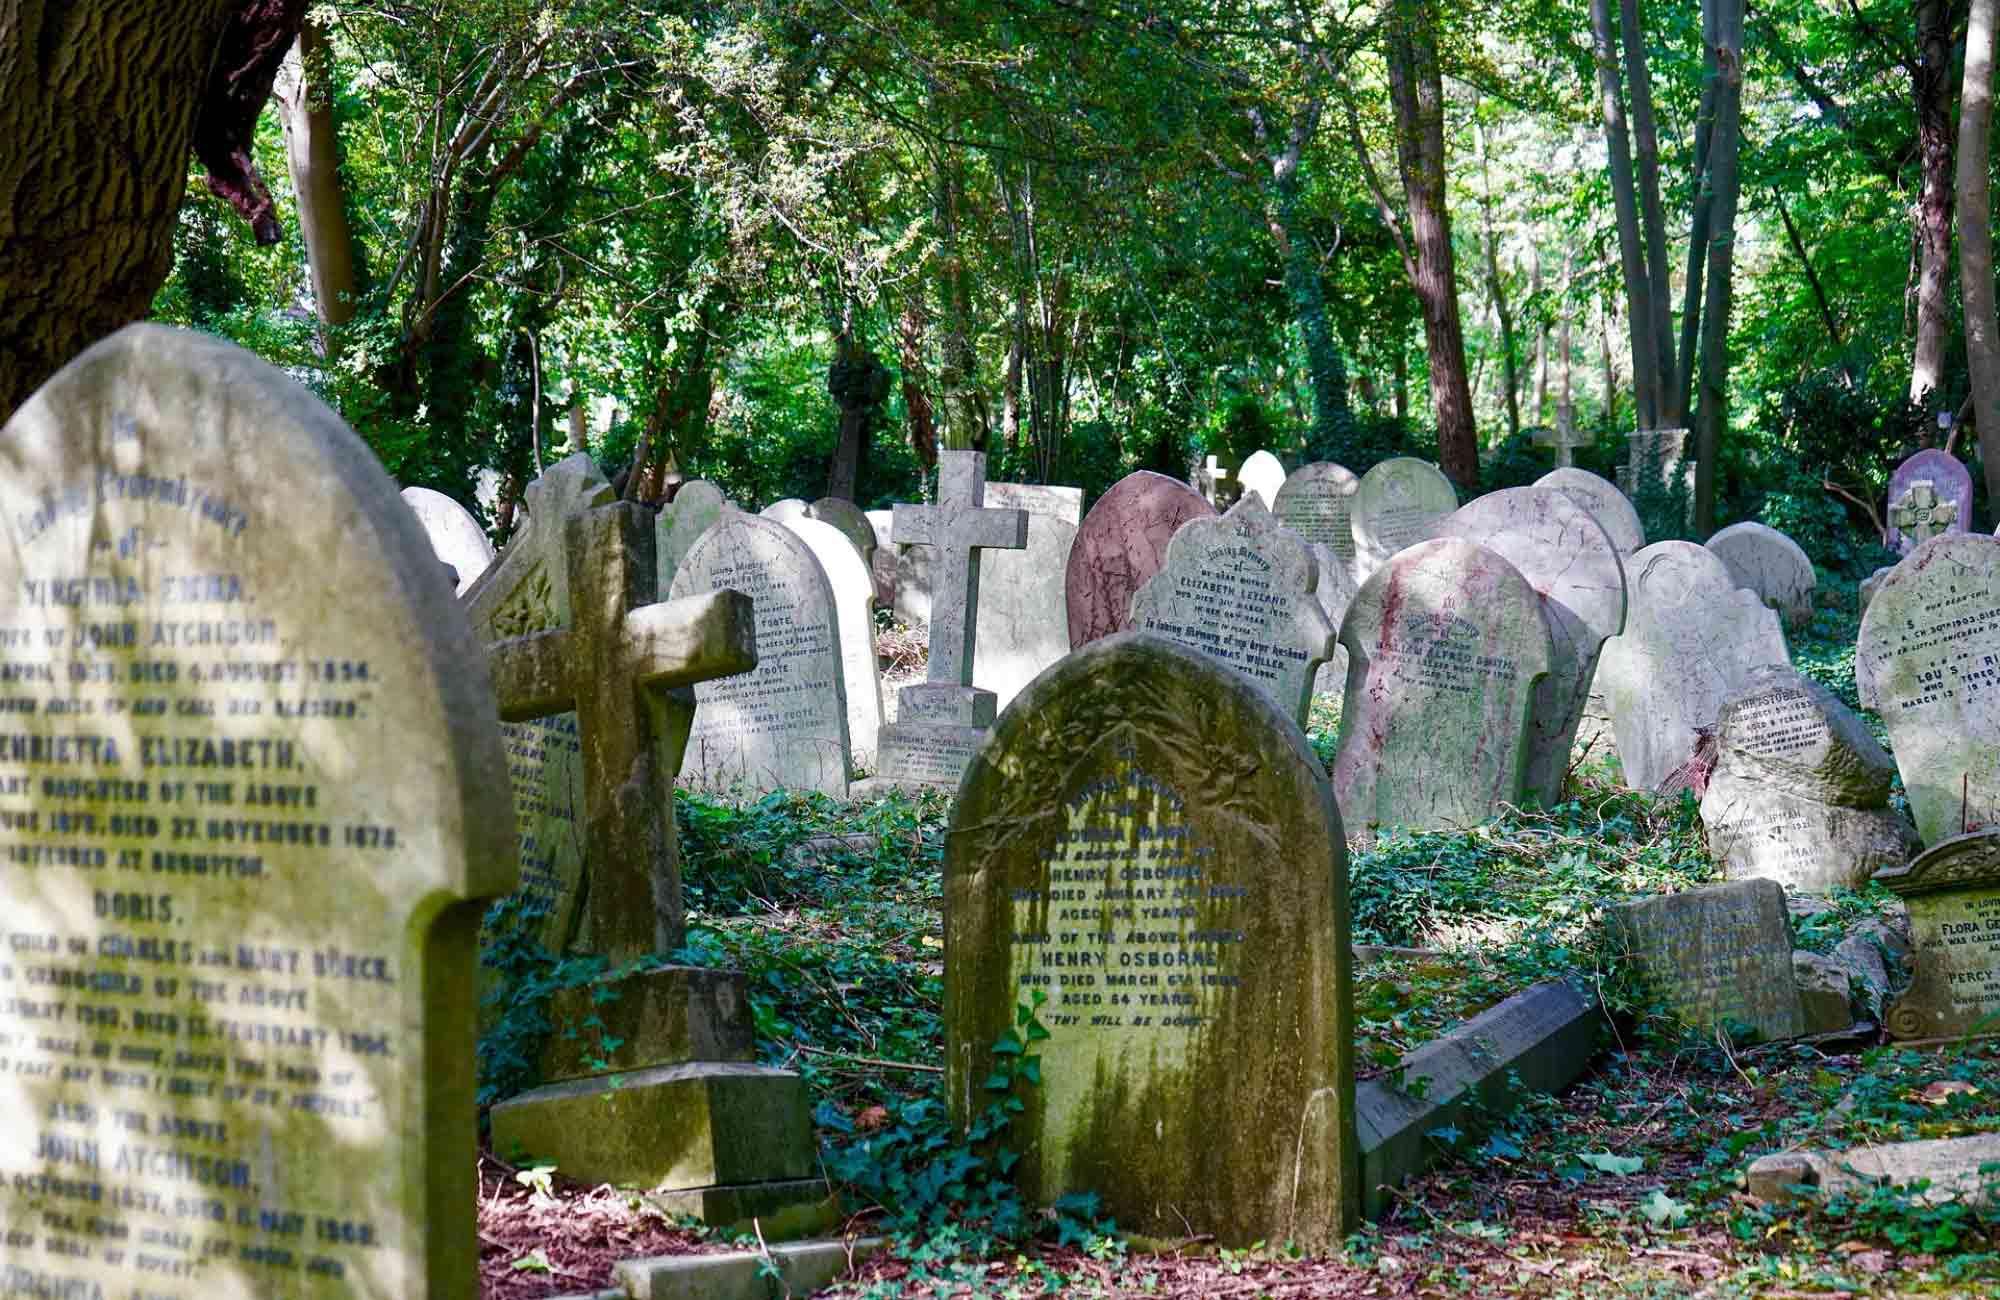 Voyage Angleterre - Londres cimetière d'highgate - Amplitudes